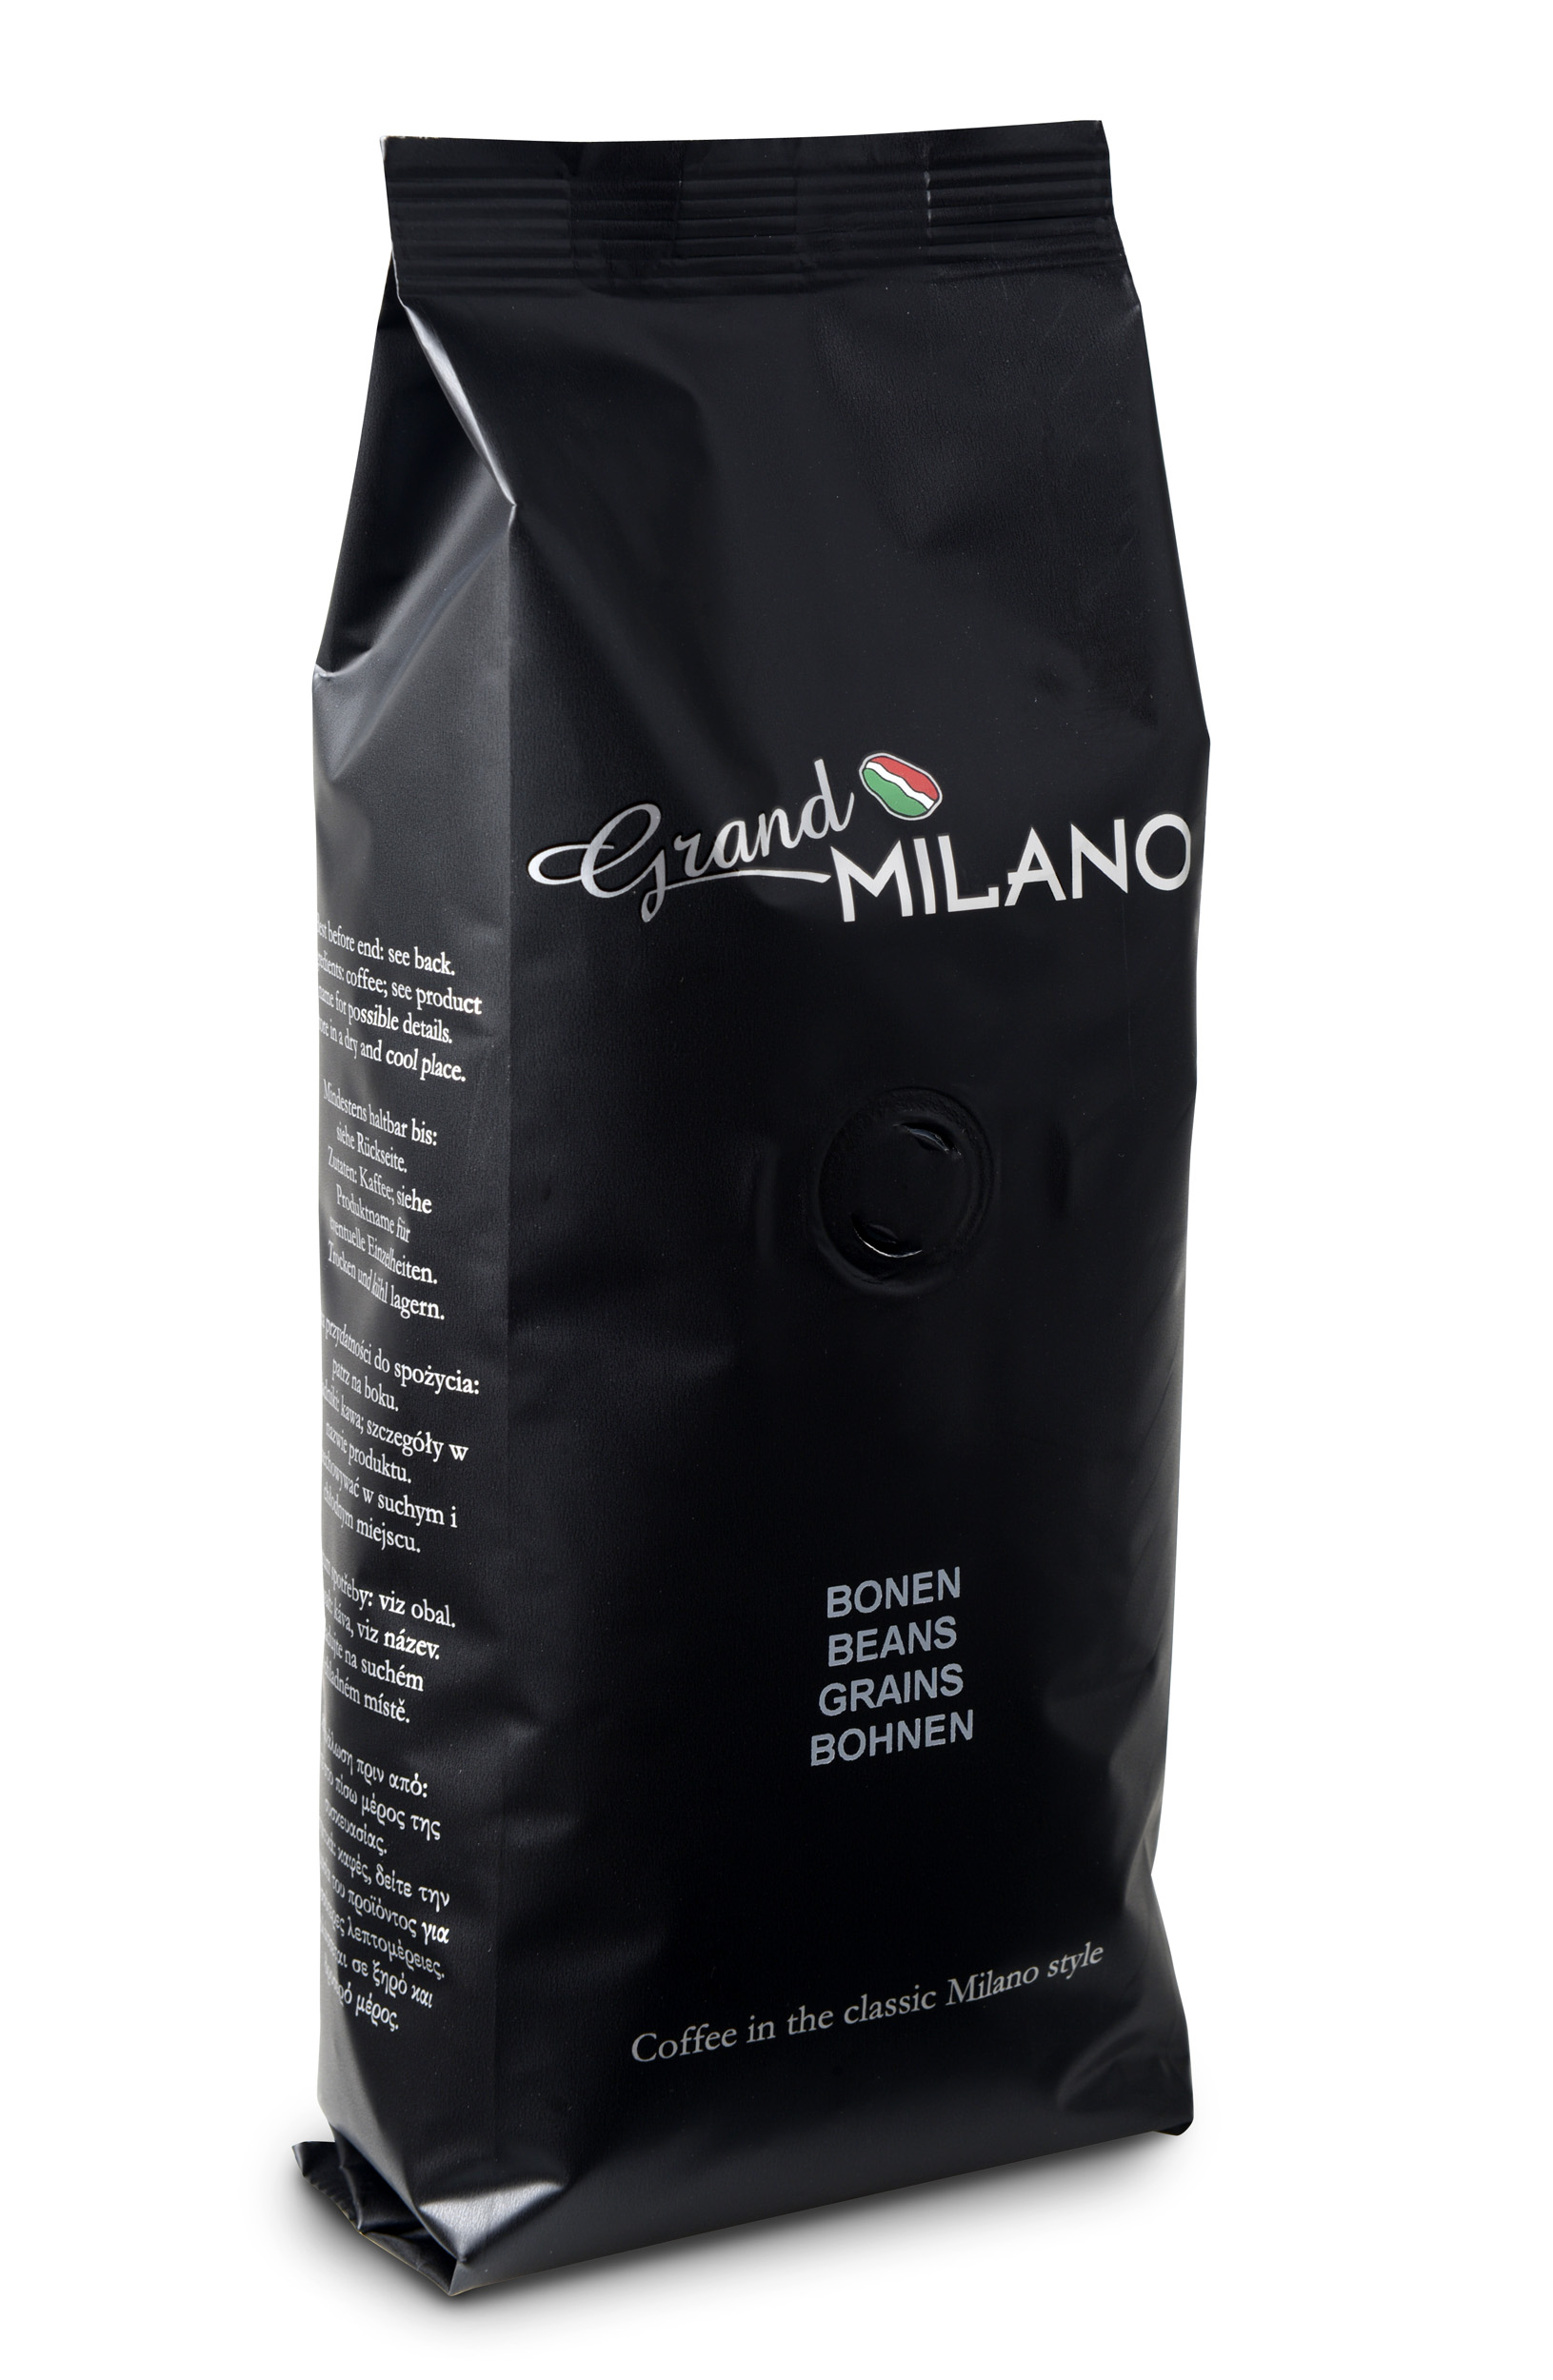 Cafea Dolce, cafea boabe, Miko, Cafea Cluj-Napoca boabe